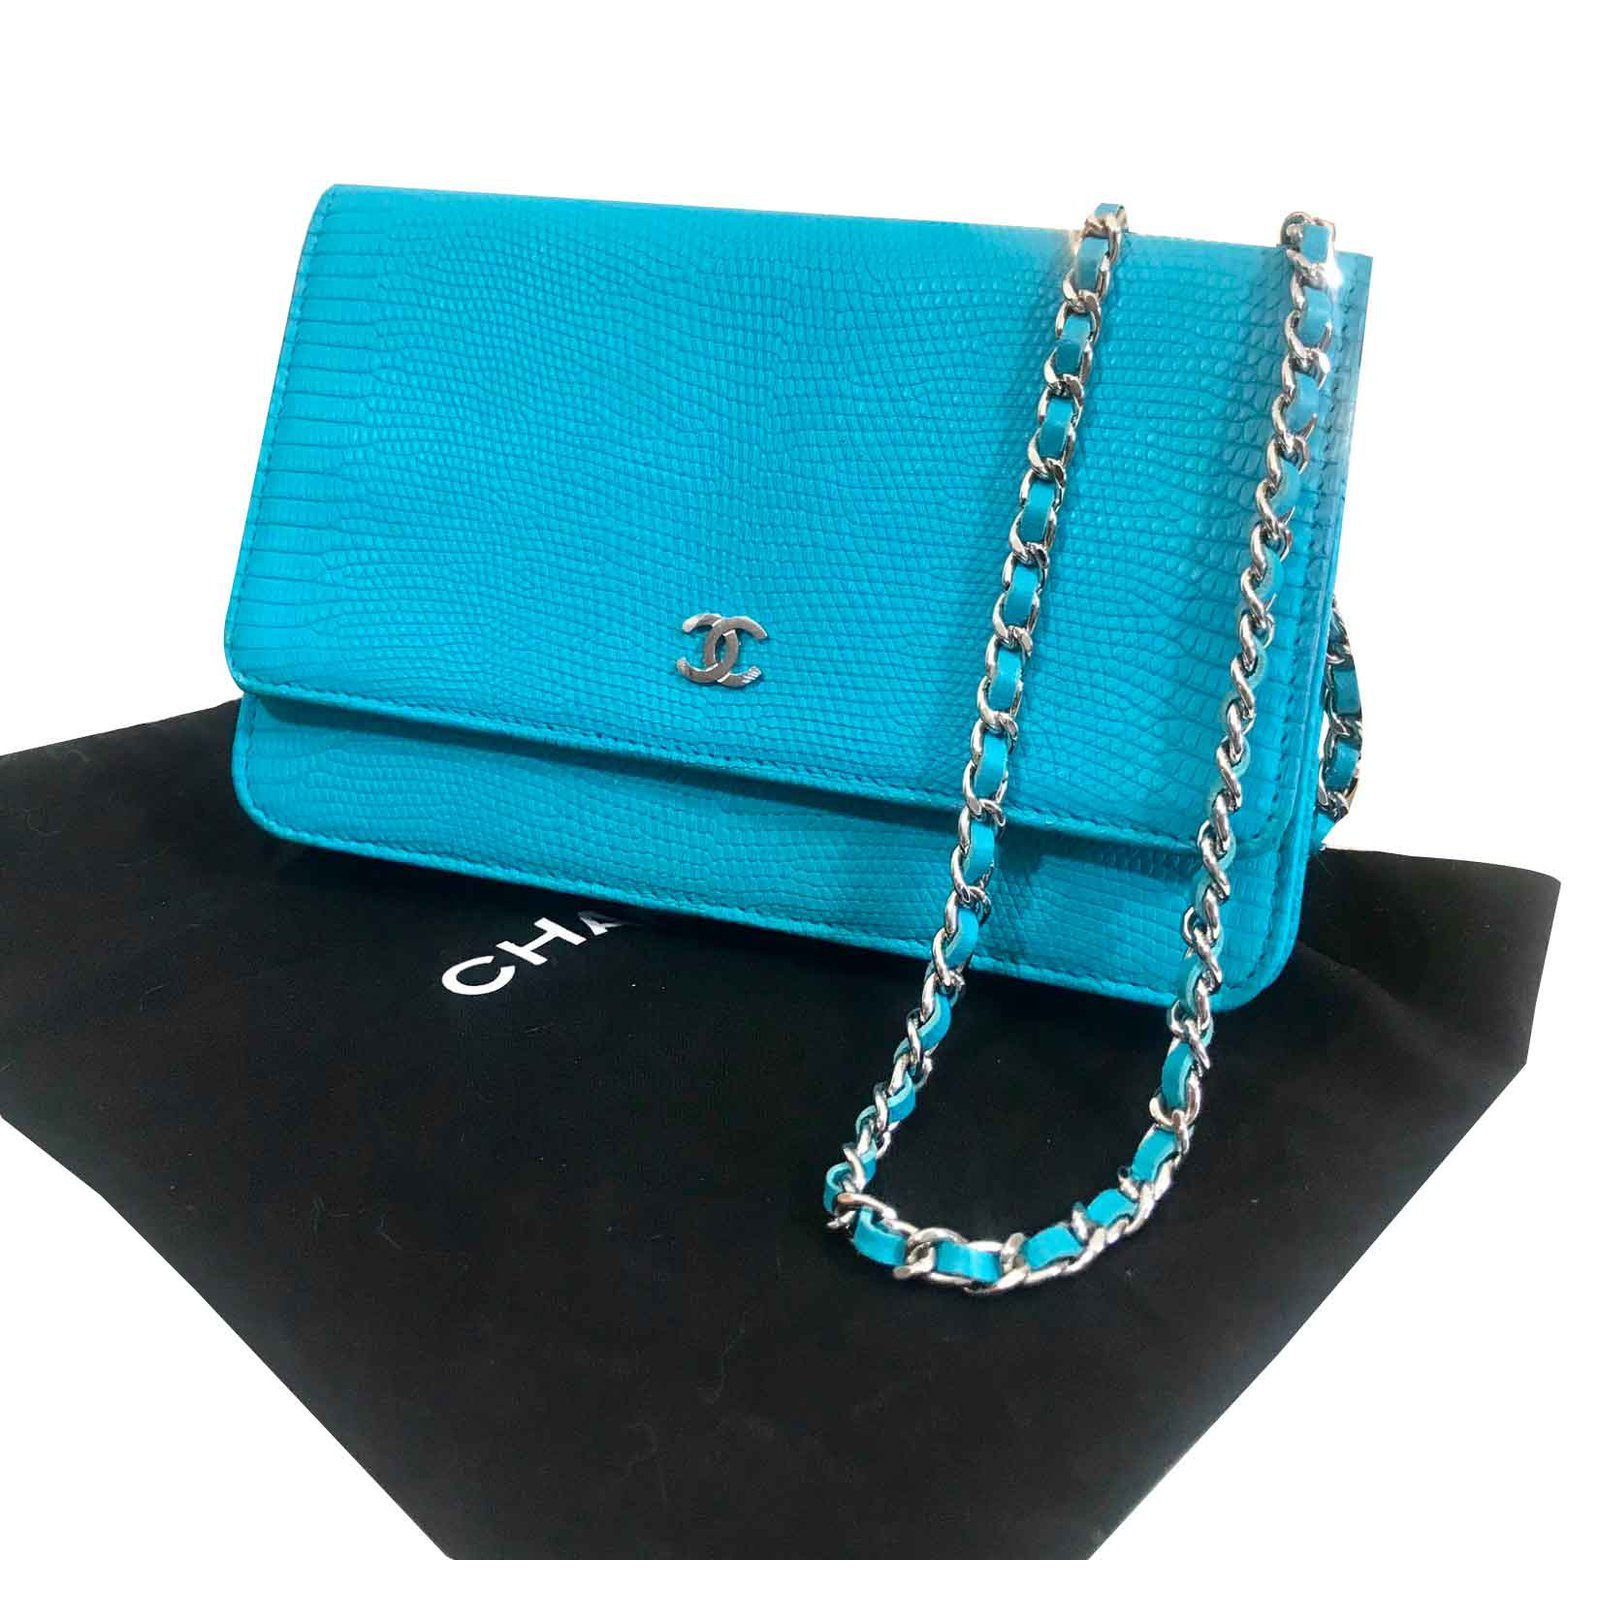 a8bee57ae965 Chanel WOC Handbags Leather Turquoise ref.90930 - Joli Closet